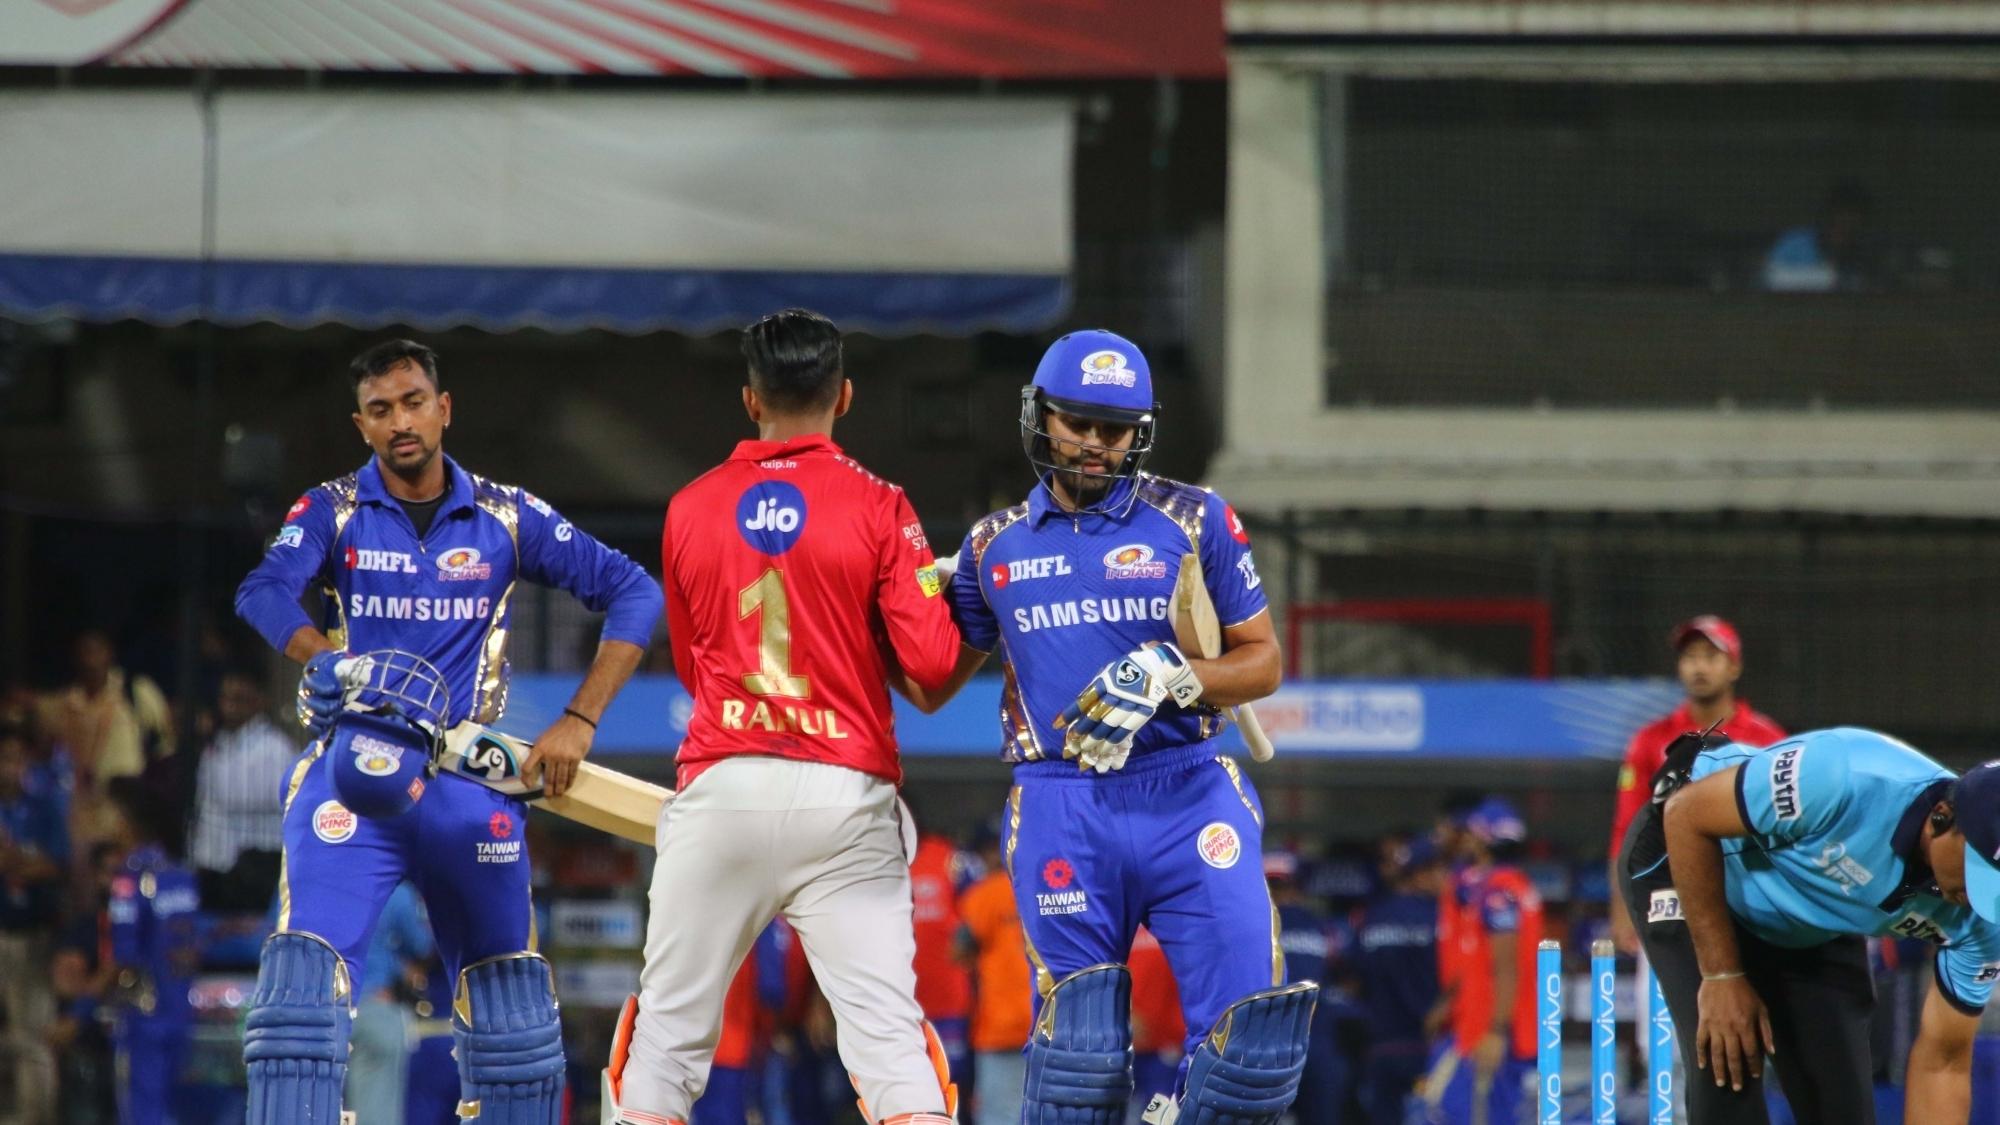 IPL 2018 : KXIP v MI- क्रुणाल पांड्या की तूफानी पारी से मुंबई इंडियंस को 6 विकेट से मिली जीत